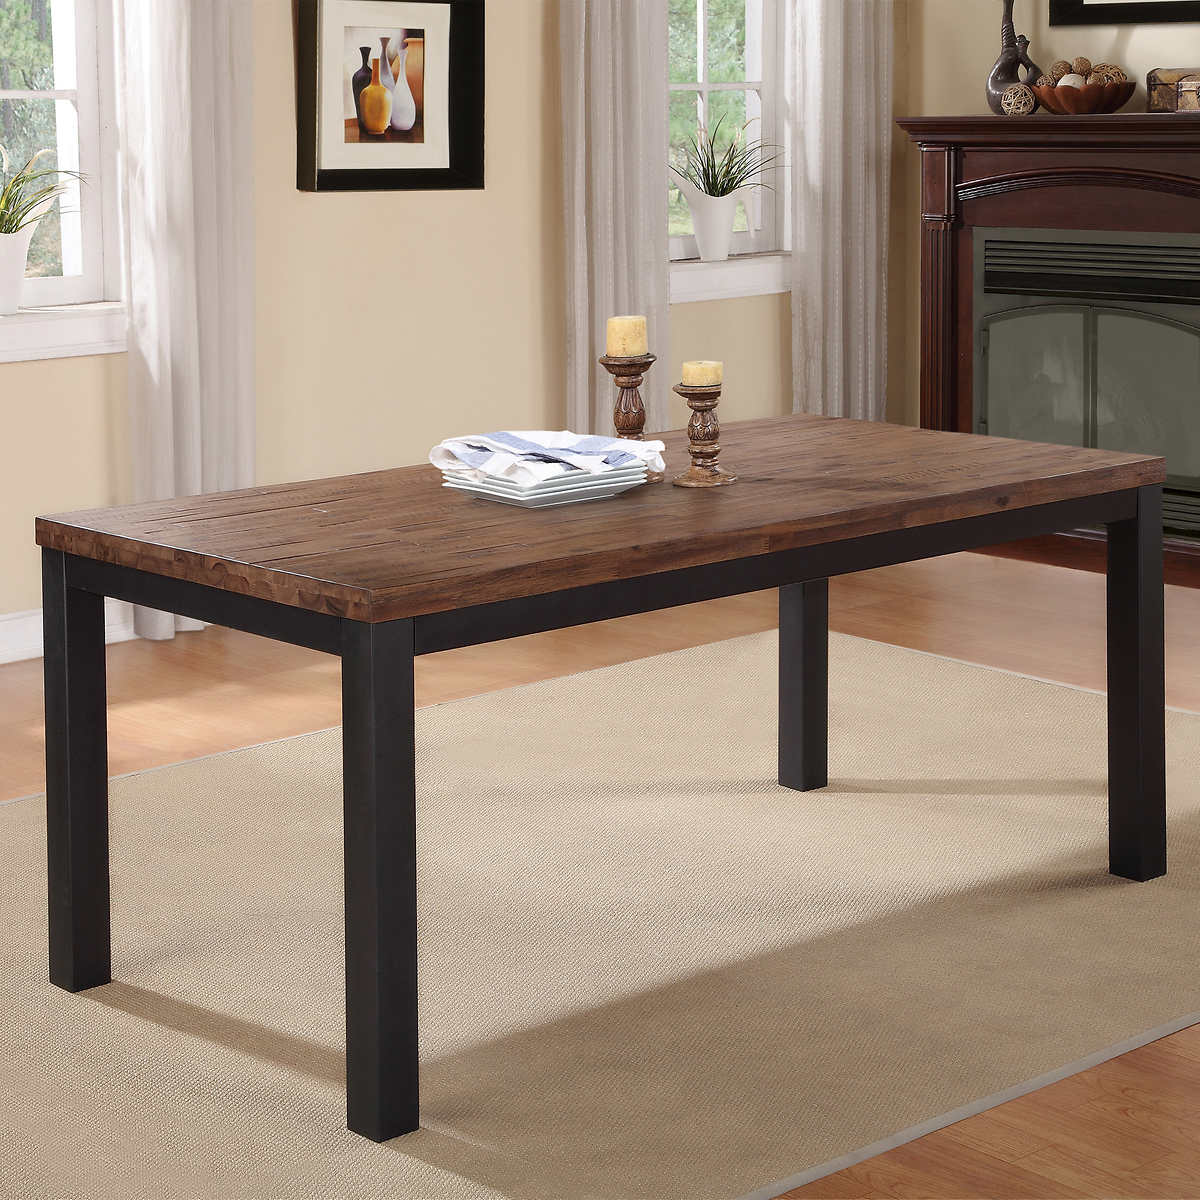 Tables Costco - Costco dining room sets